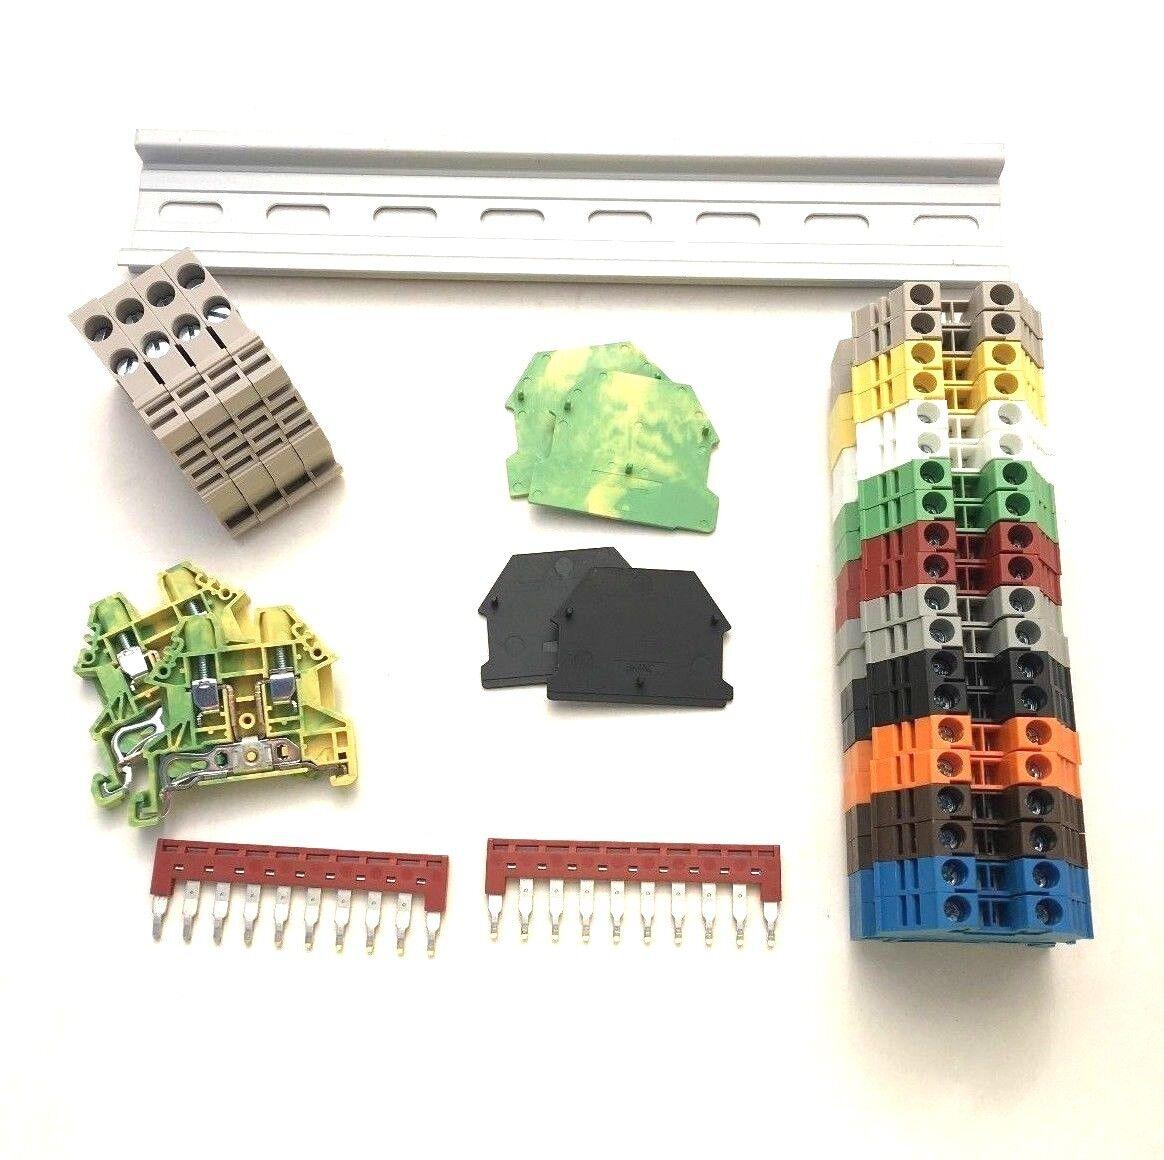 Terminal Block Jumpers Ebay Wiring Board Busbar Any Color Din Rail Kit Dinkle 20 Dk4n 10awg 30a 600v Gnd Jumper